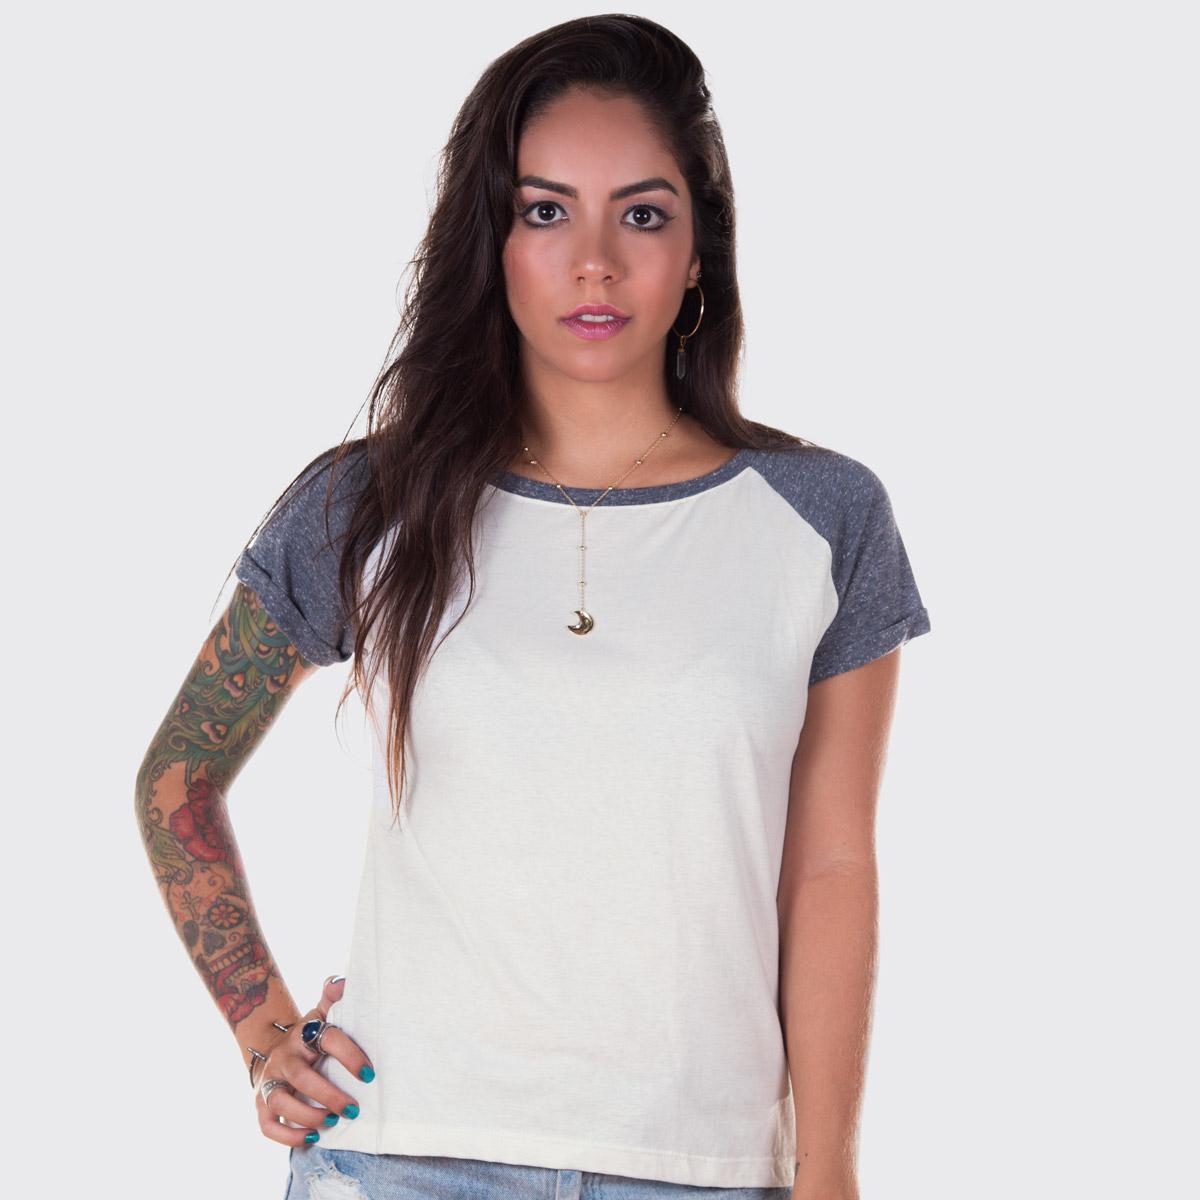 Camiseta Raglan Feminina Off White e Cinza